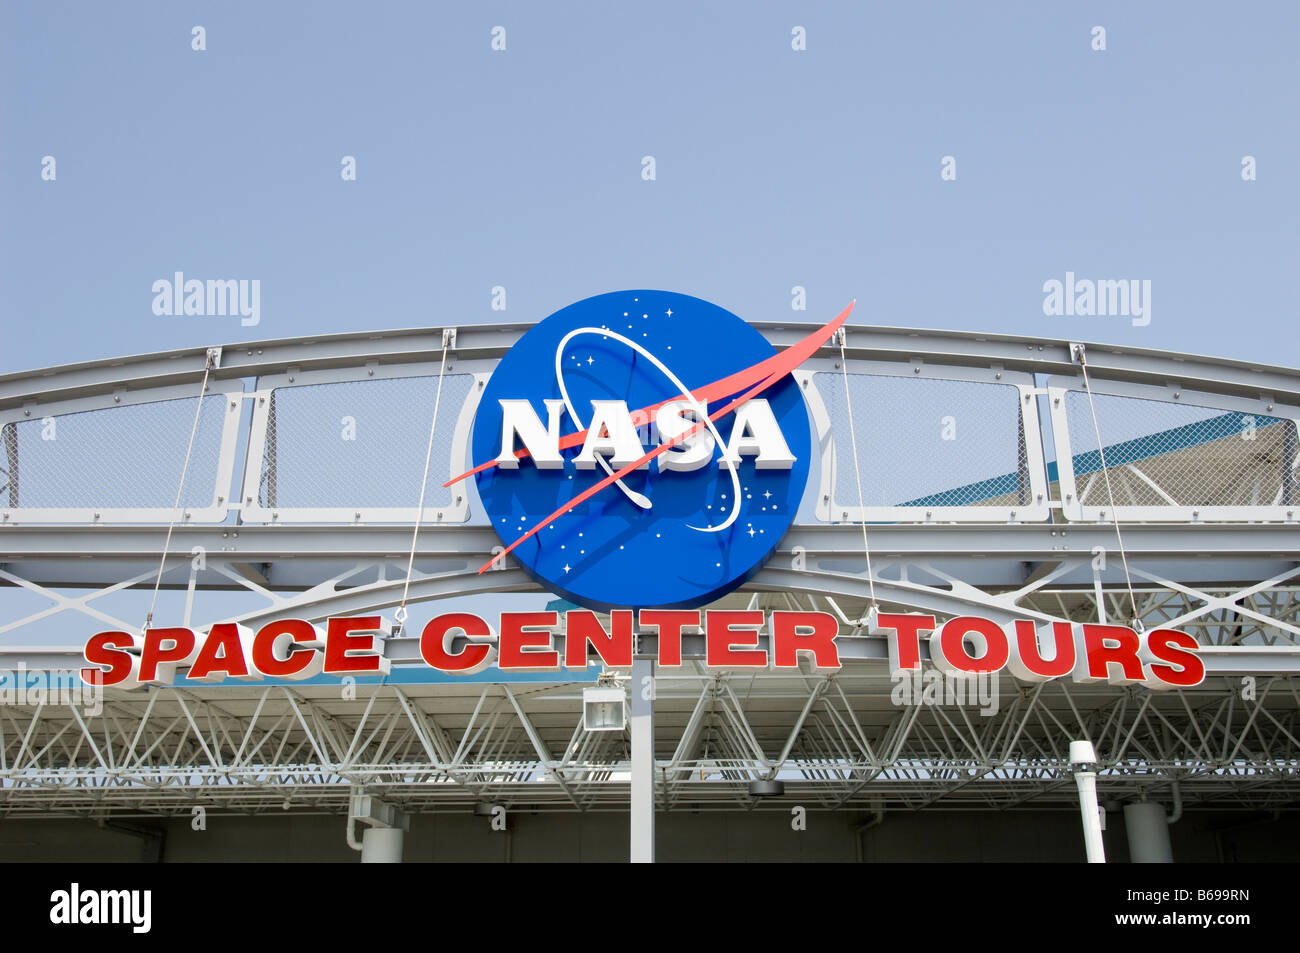 NASA Cape Canaveral Gold Coast Florida United States of America - Stock Image